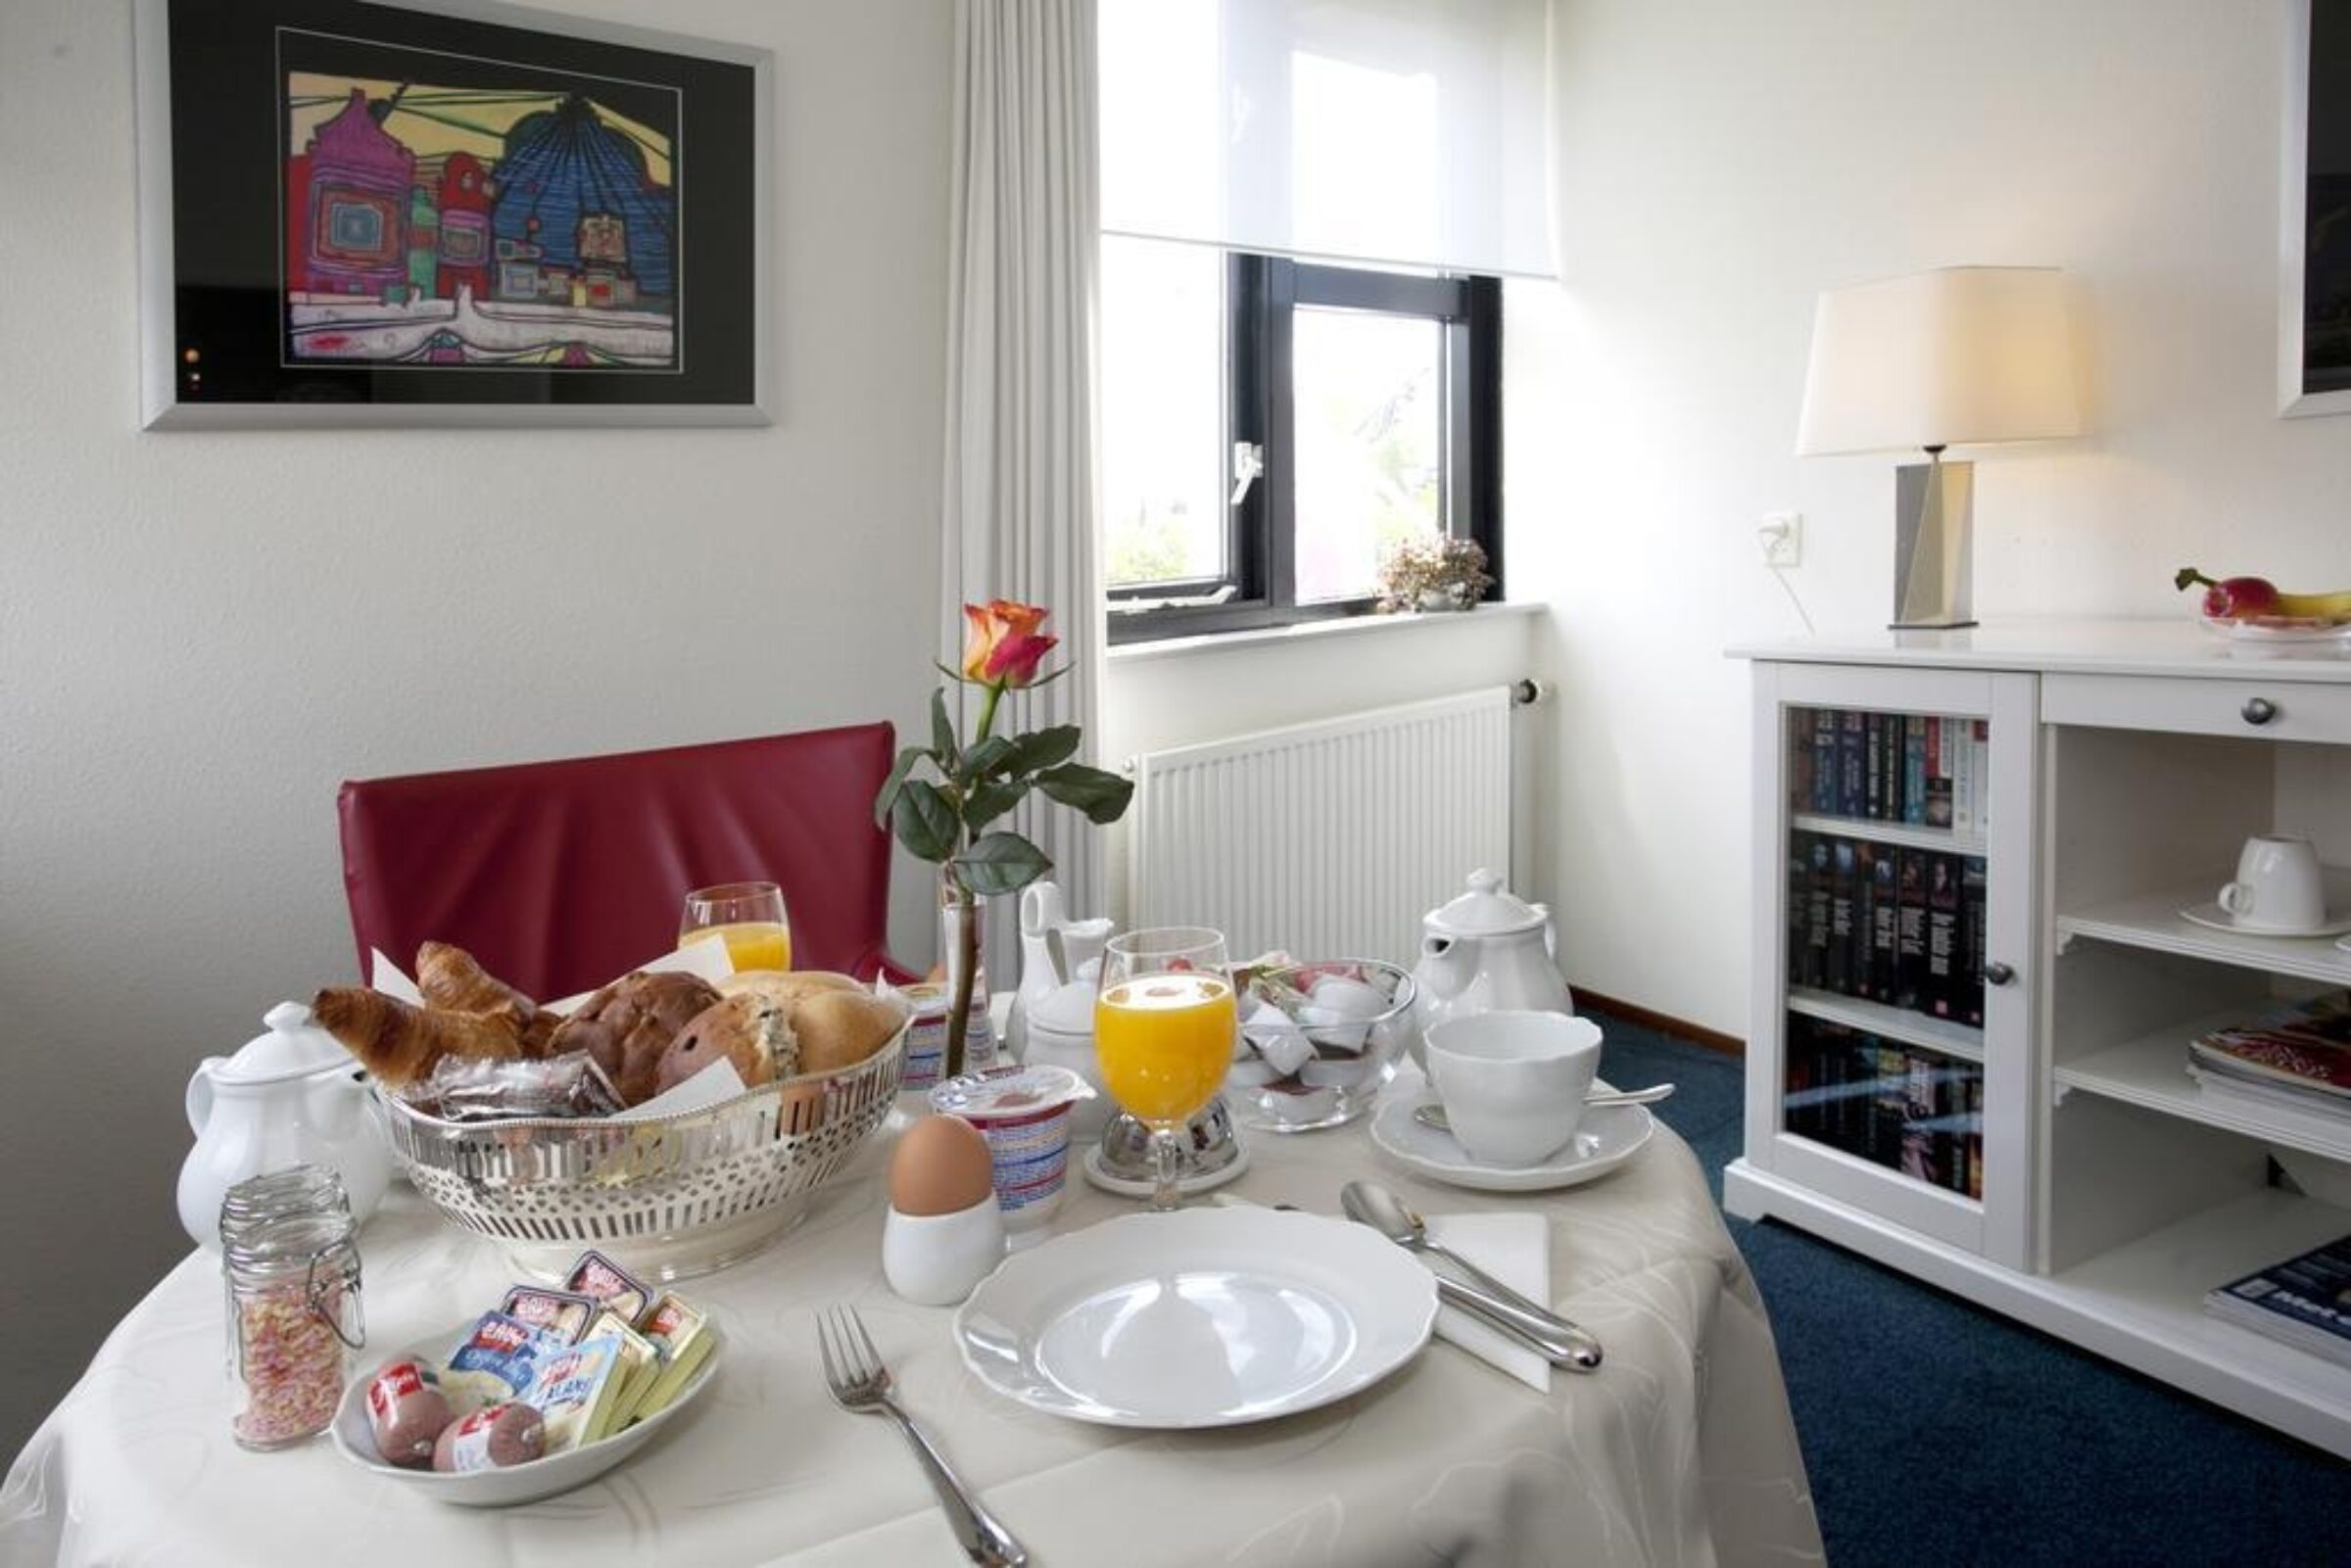 Bed breakfast Holter Enschede4